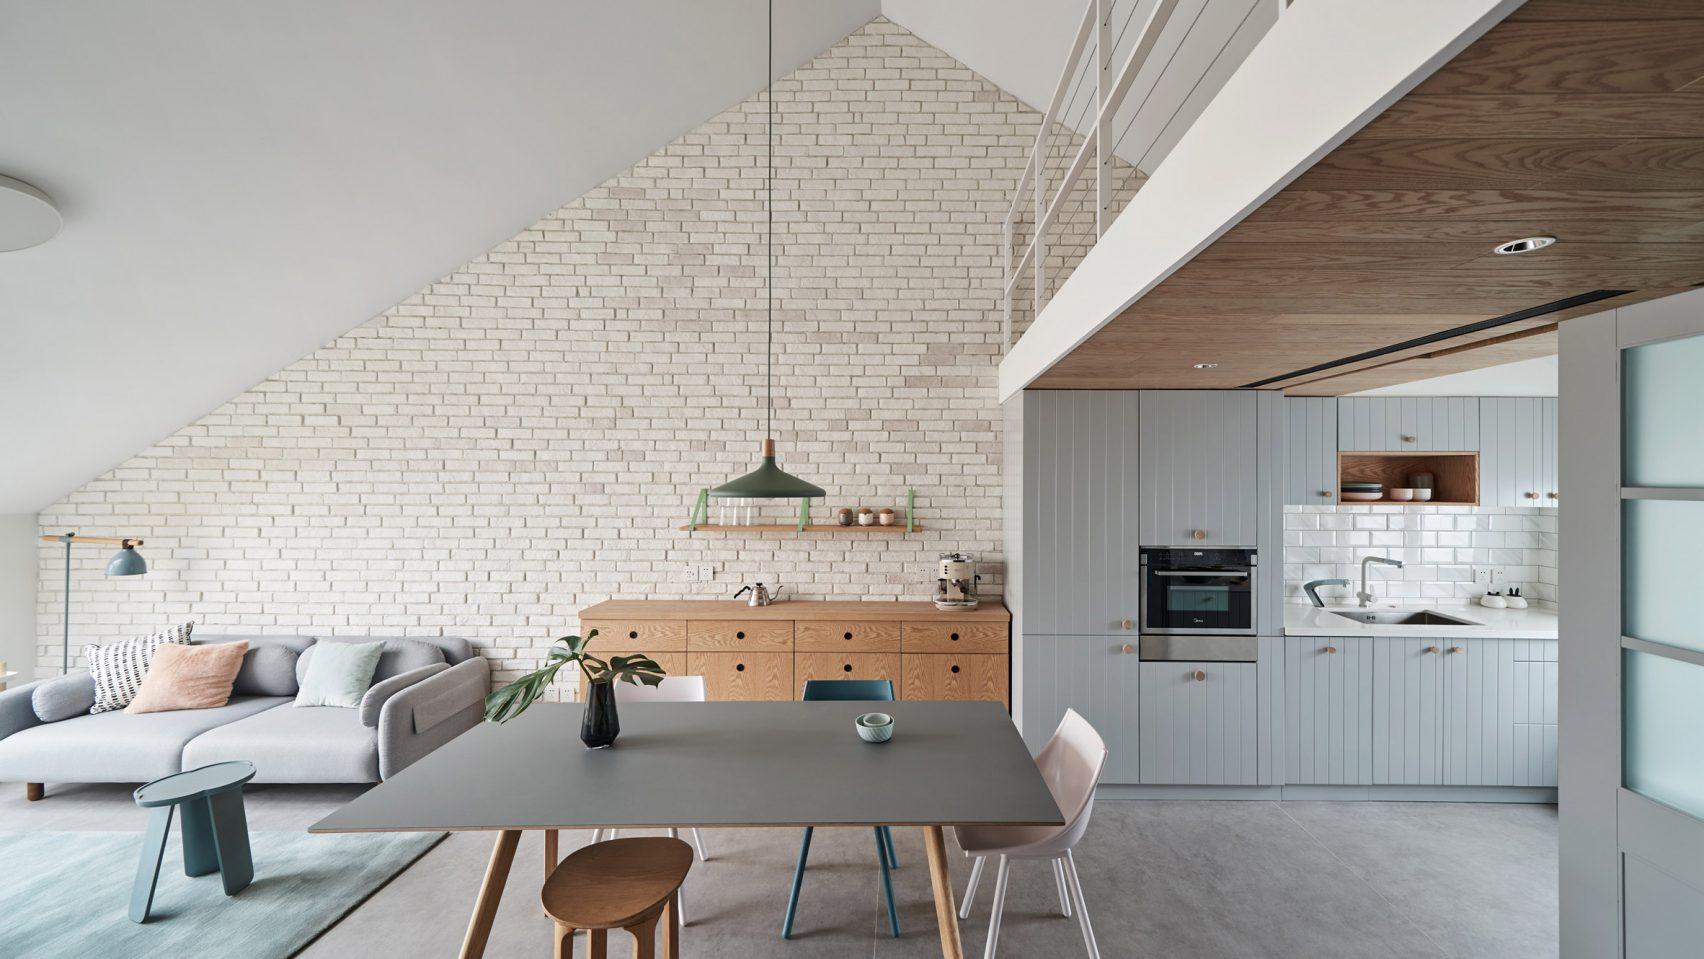 căn hộ cho gia đình trẻ starburst-house-hao-design-interiors-residential-china-beijing-elledecoration vietnam 2